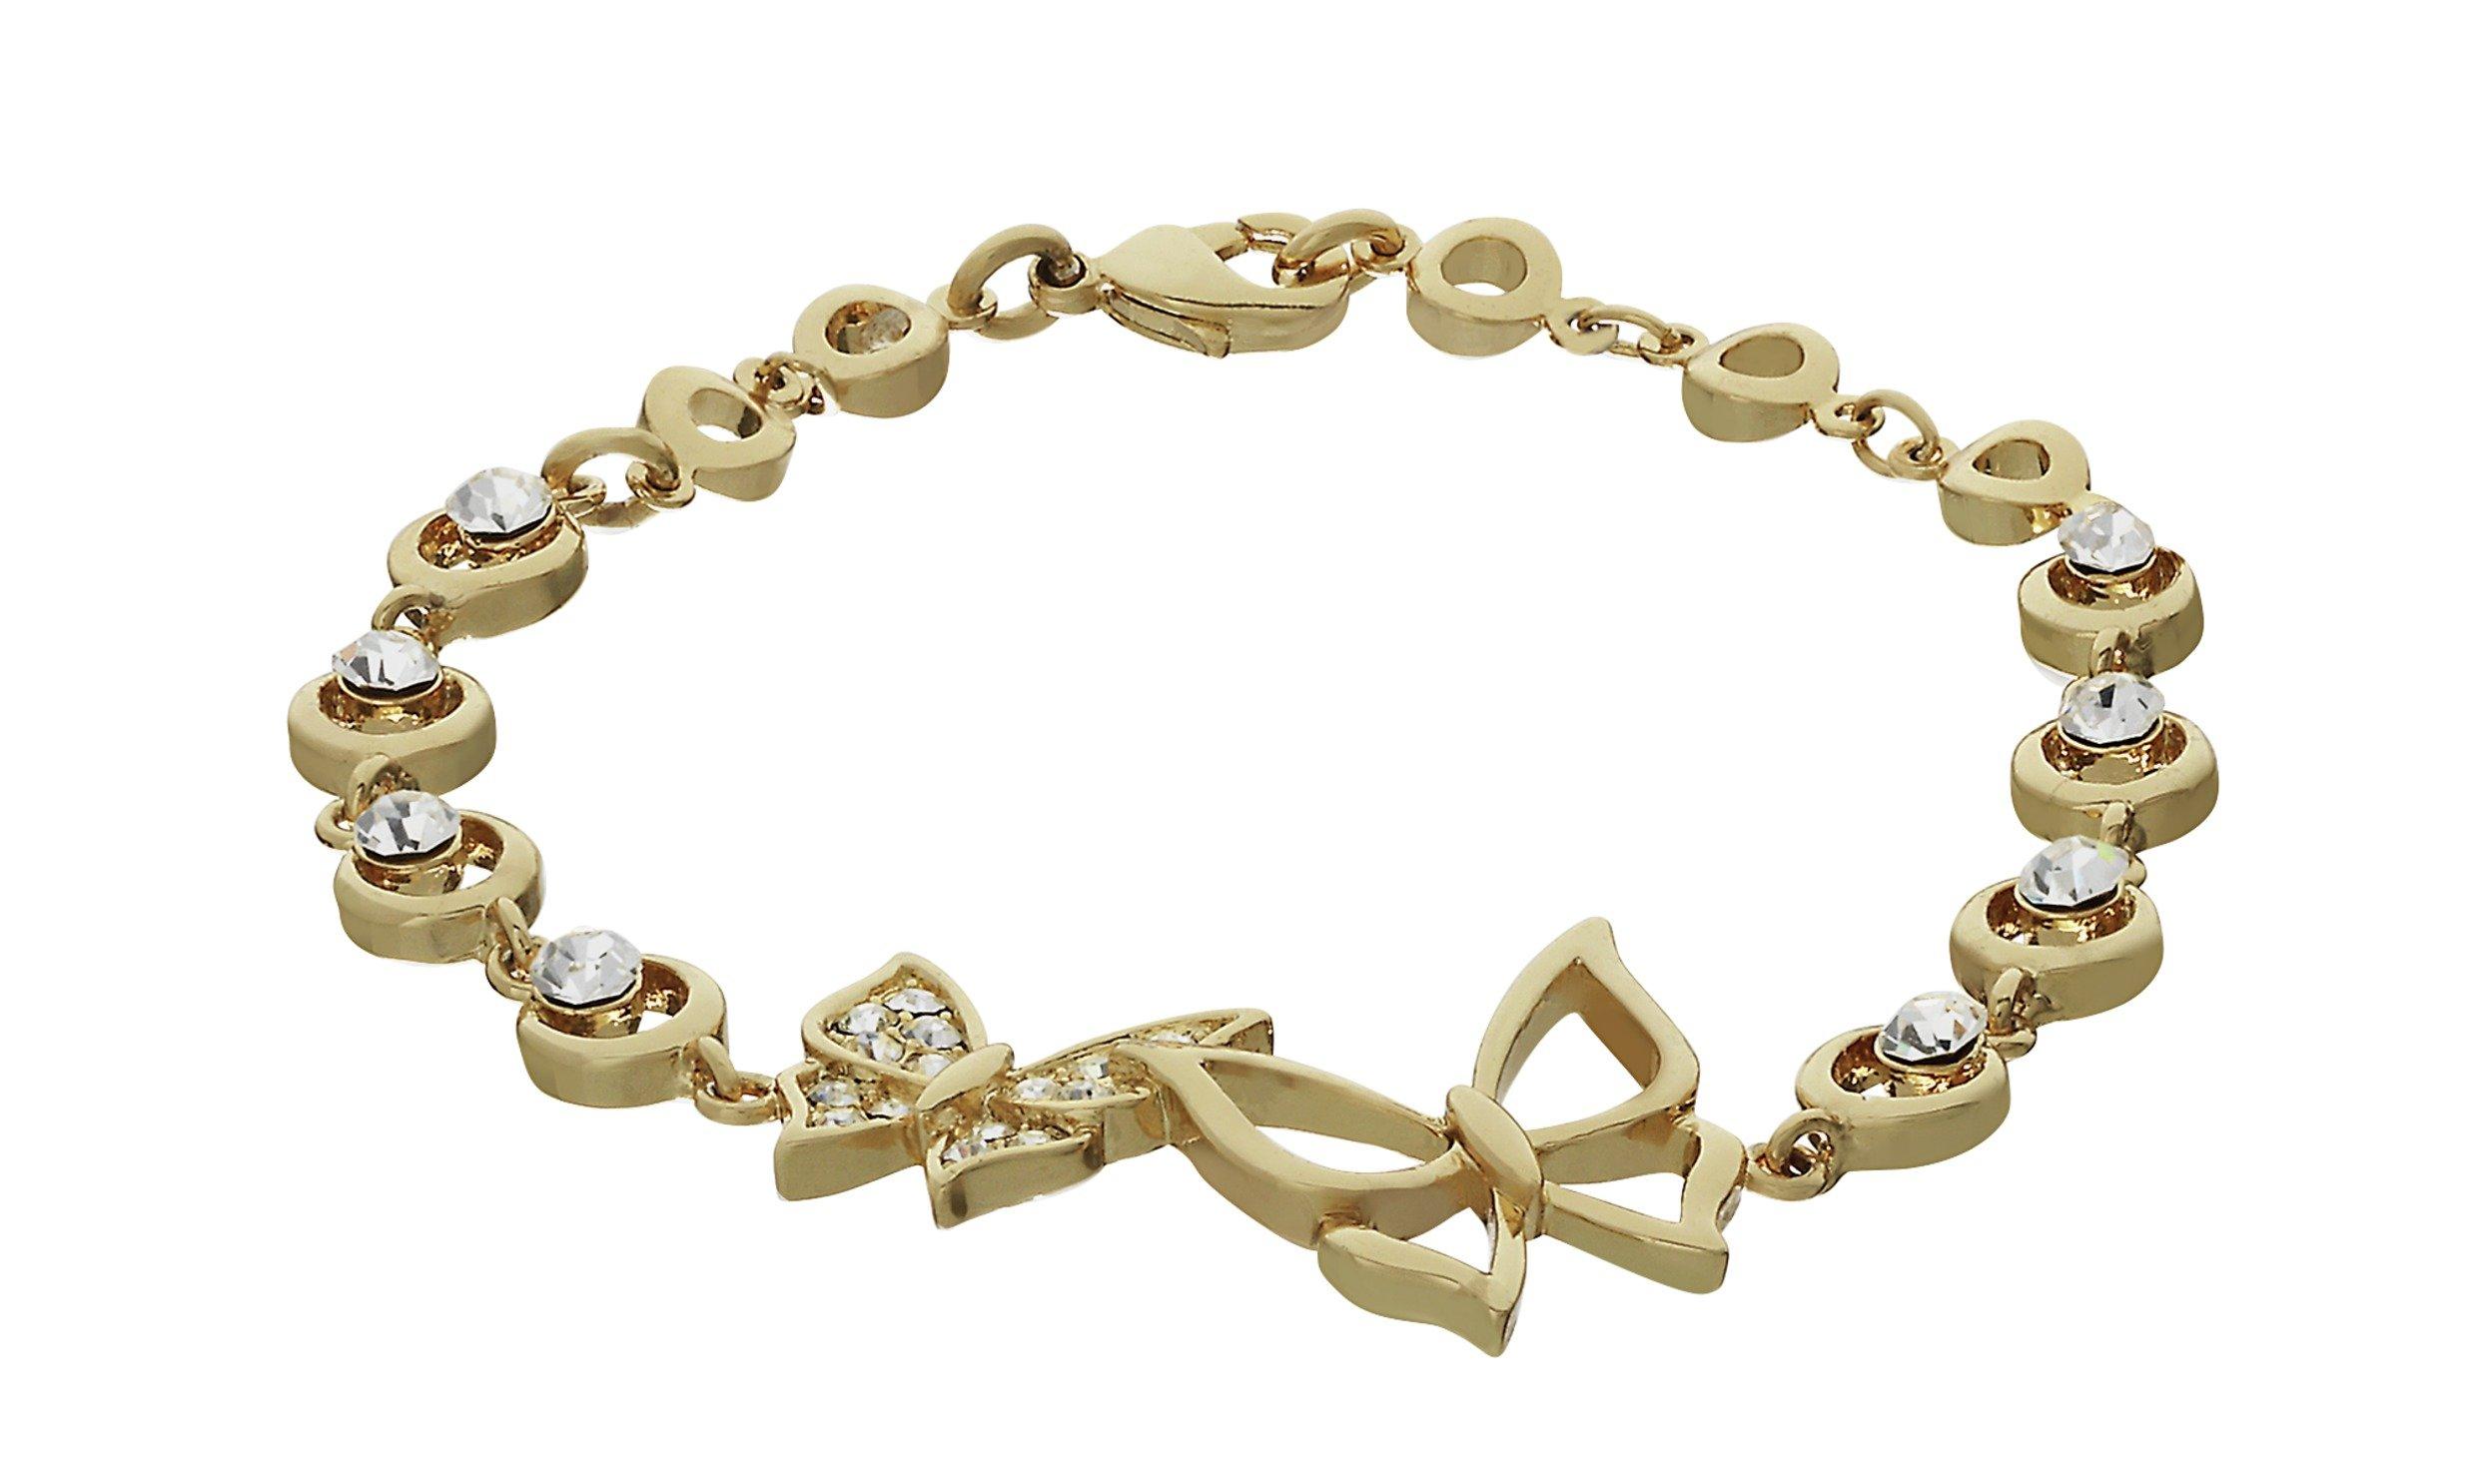 18 Carat Gold - Plated - Sterling Silver - Crystal Butterfly Bracelet.